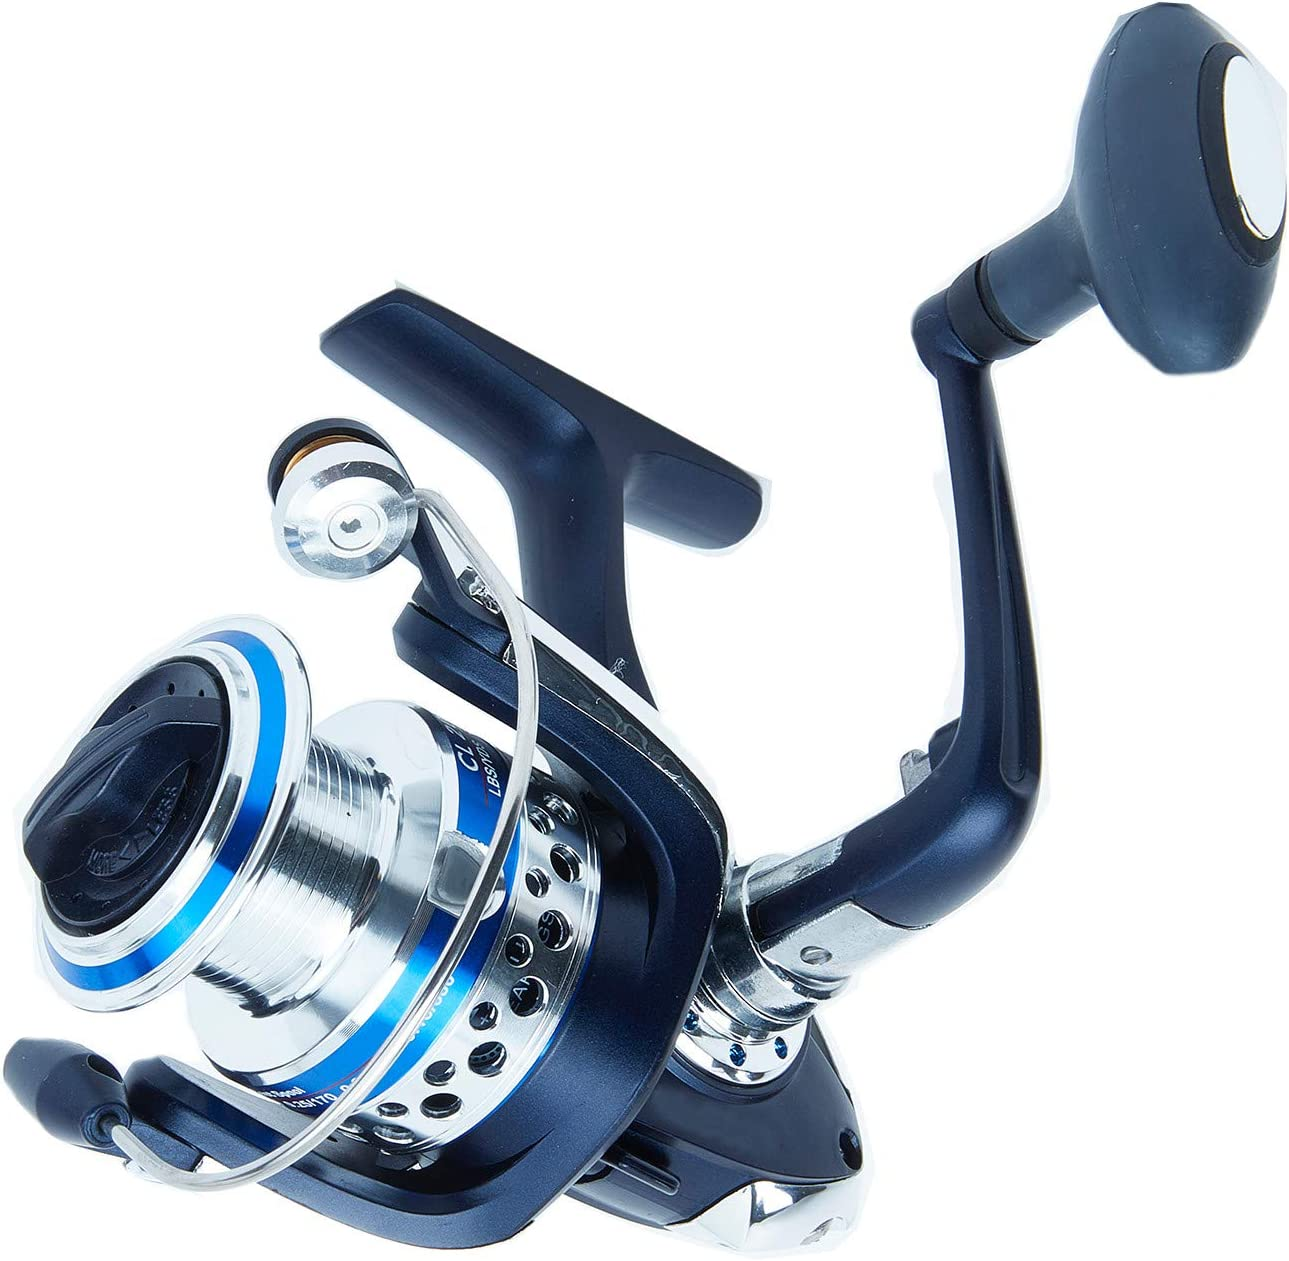 Spinning cl 3000 carrete de pesca para truchas rollo freno frontal ...